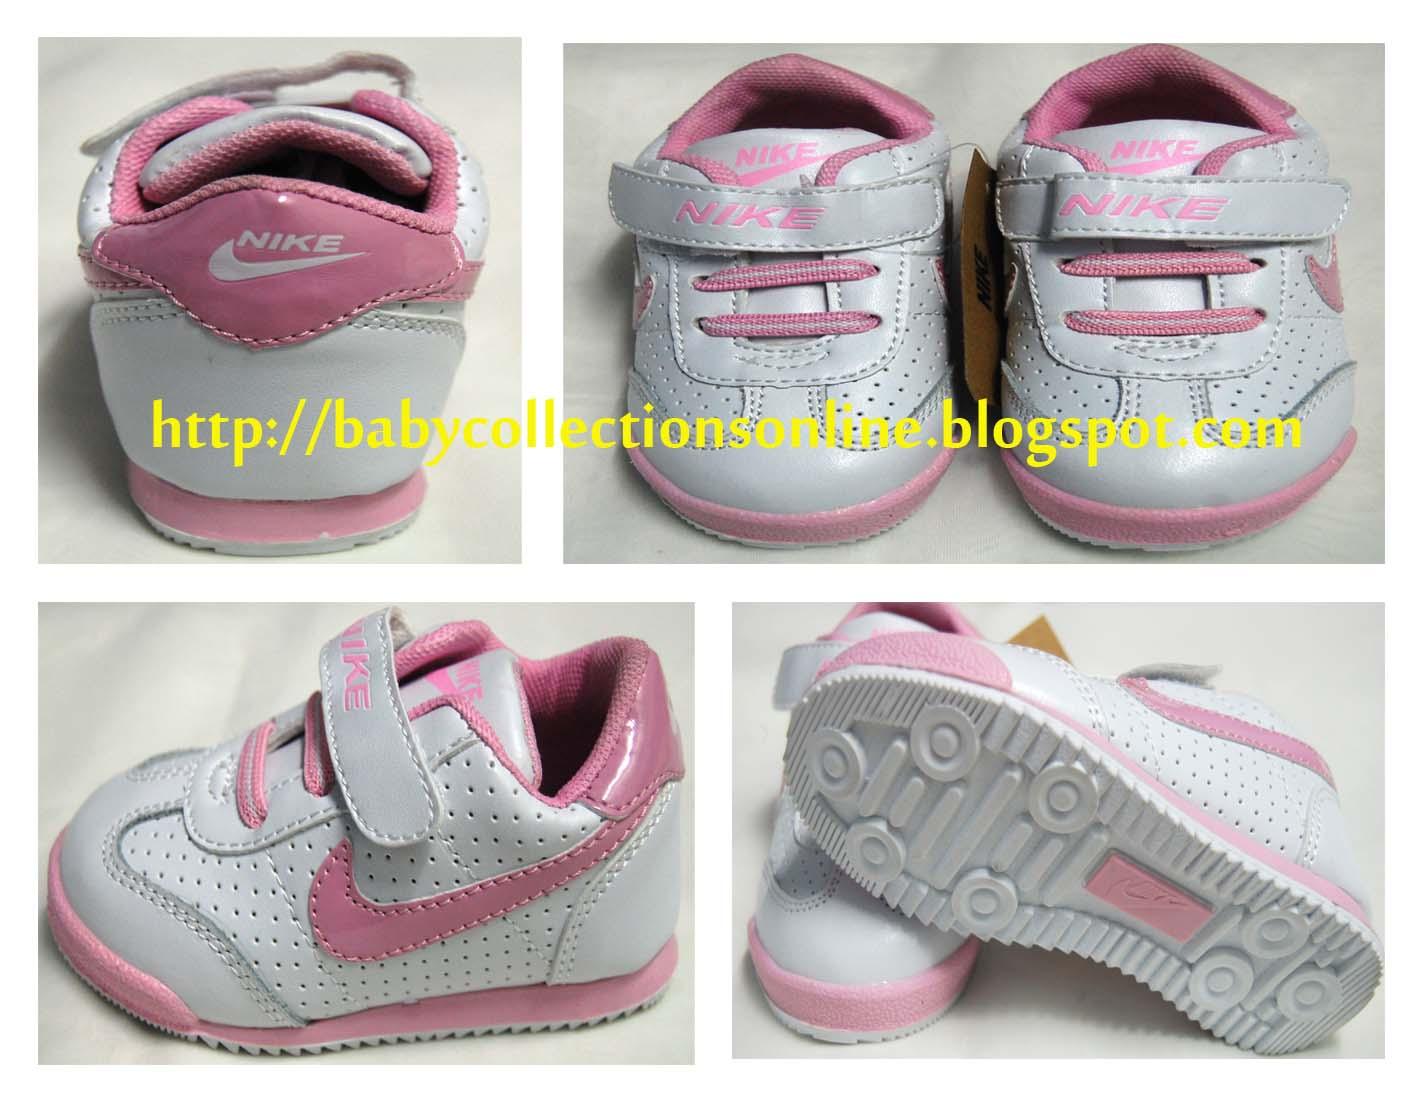 http://2.bp.blogspot.com/_rTN8DnFwGrg/THSUjSemBLI/AAAAAAAAAZU/YyZfhJ1TuHI/s1600/nike+pink-mark.jpg